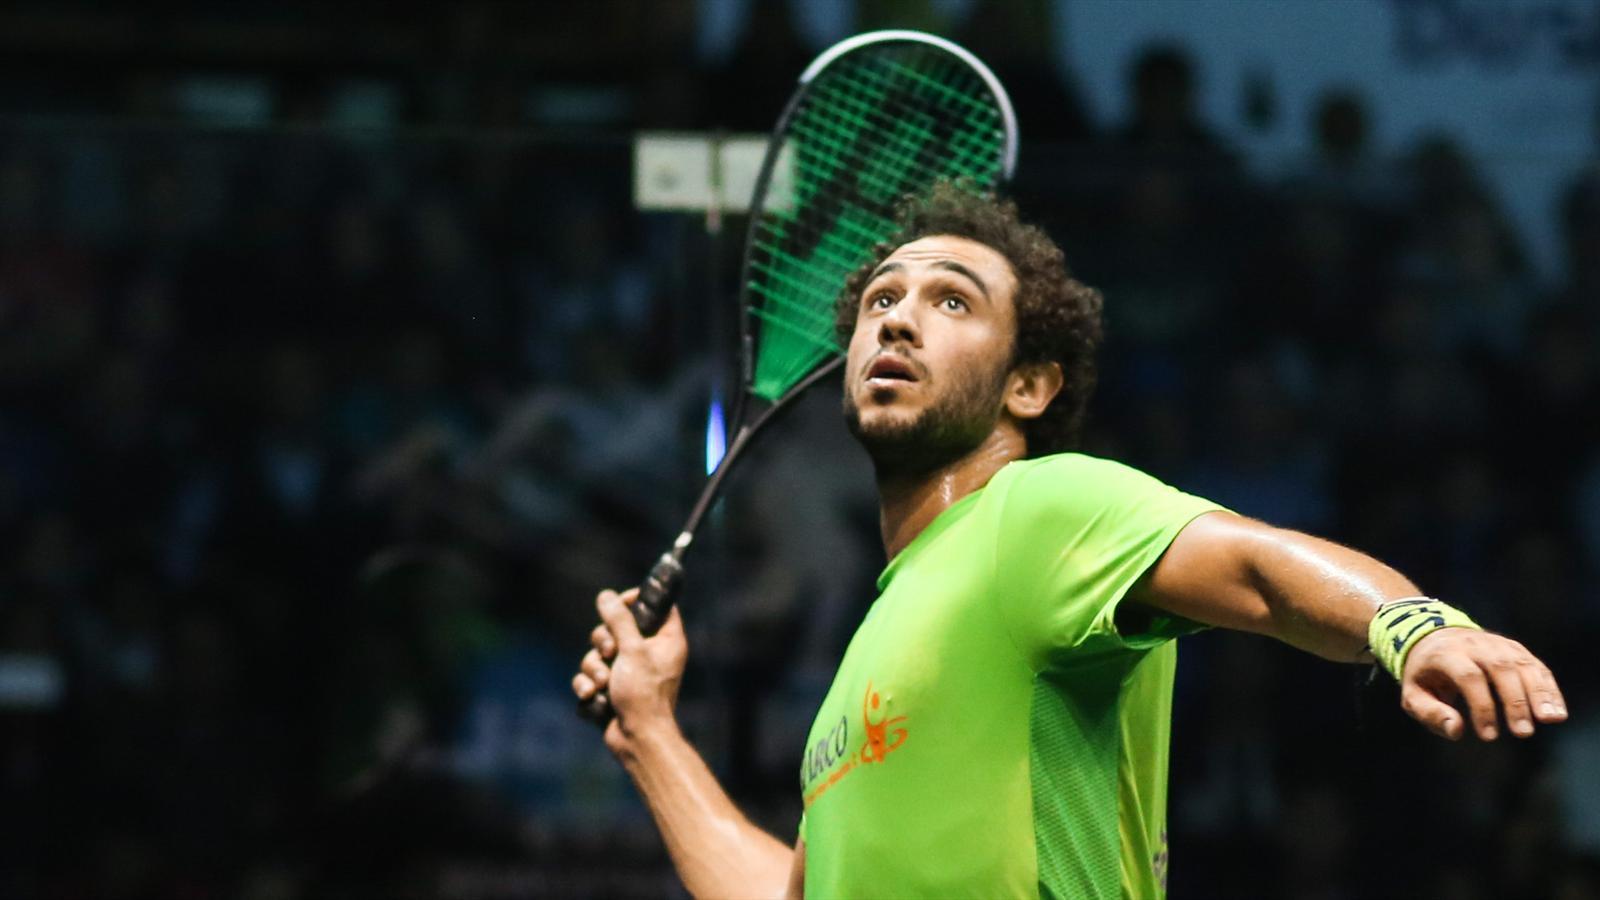 Karim Abdel Gawad and Ramy Ashour to clash in squash's World Championship final - Squash - Eurosport